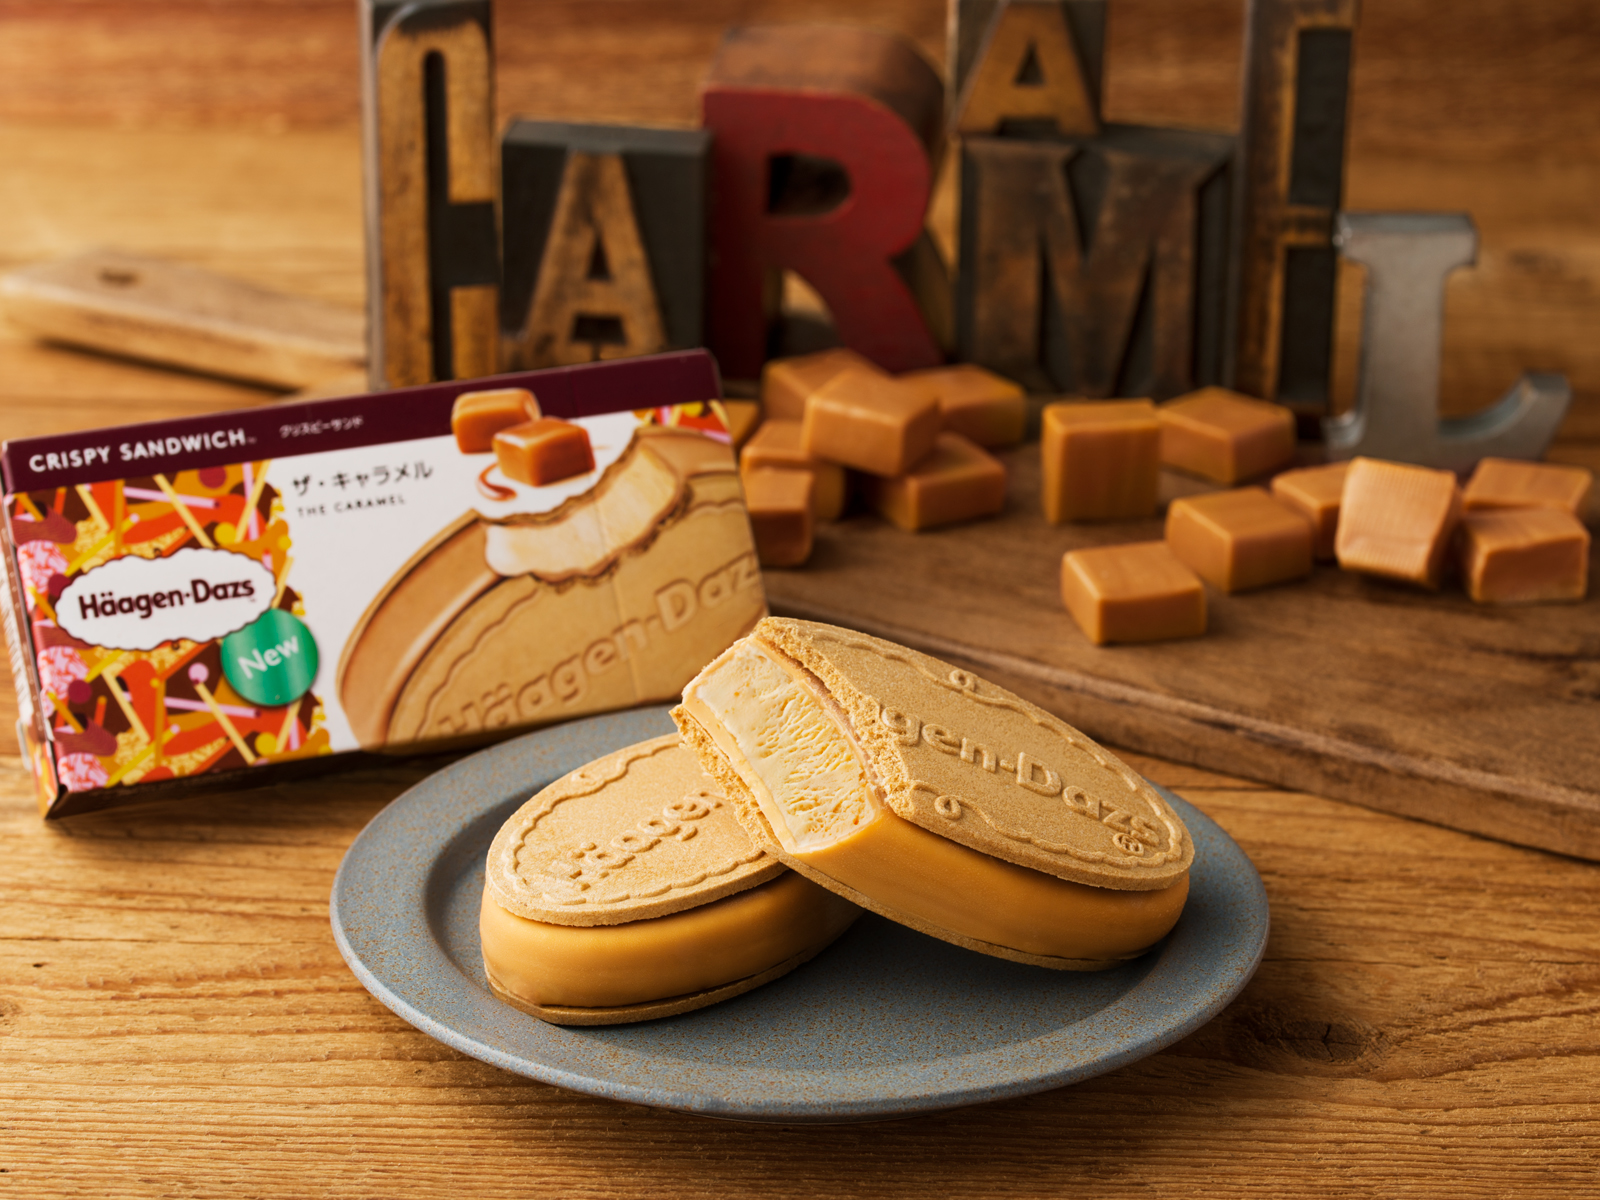 %e3%82%b6%e3%83%bb%e3%82%ad%e3%83%a3%e3%83%a9%e3%83%a1%e3%83%ab-the-caramel-haagen-dazs